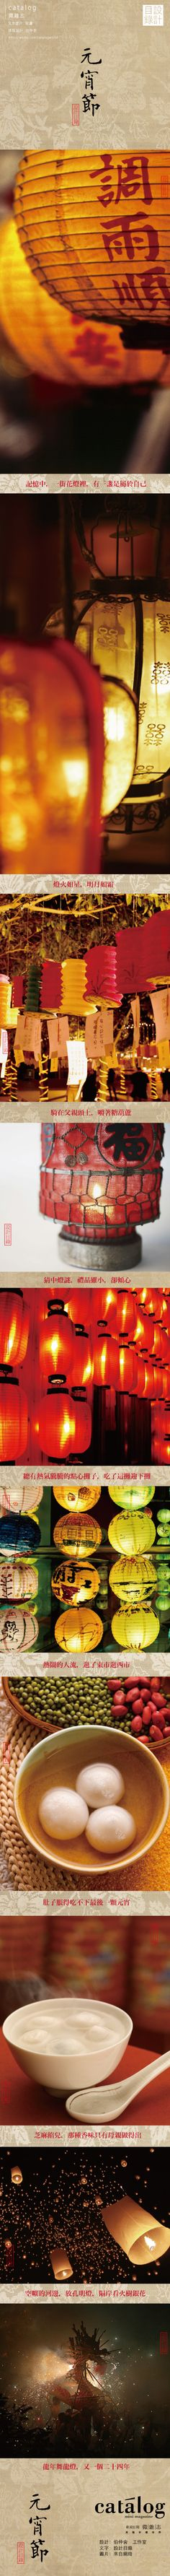 25 best Lantern Festival (January 15th on the Lunar Calendar) images ...